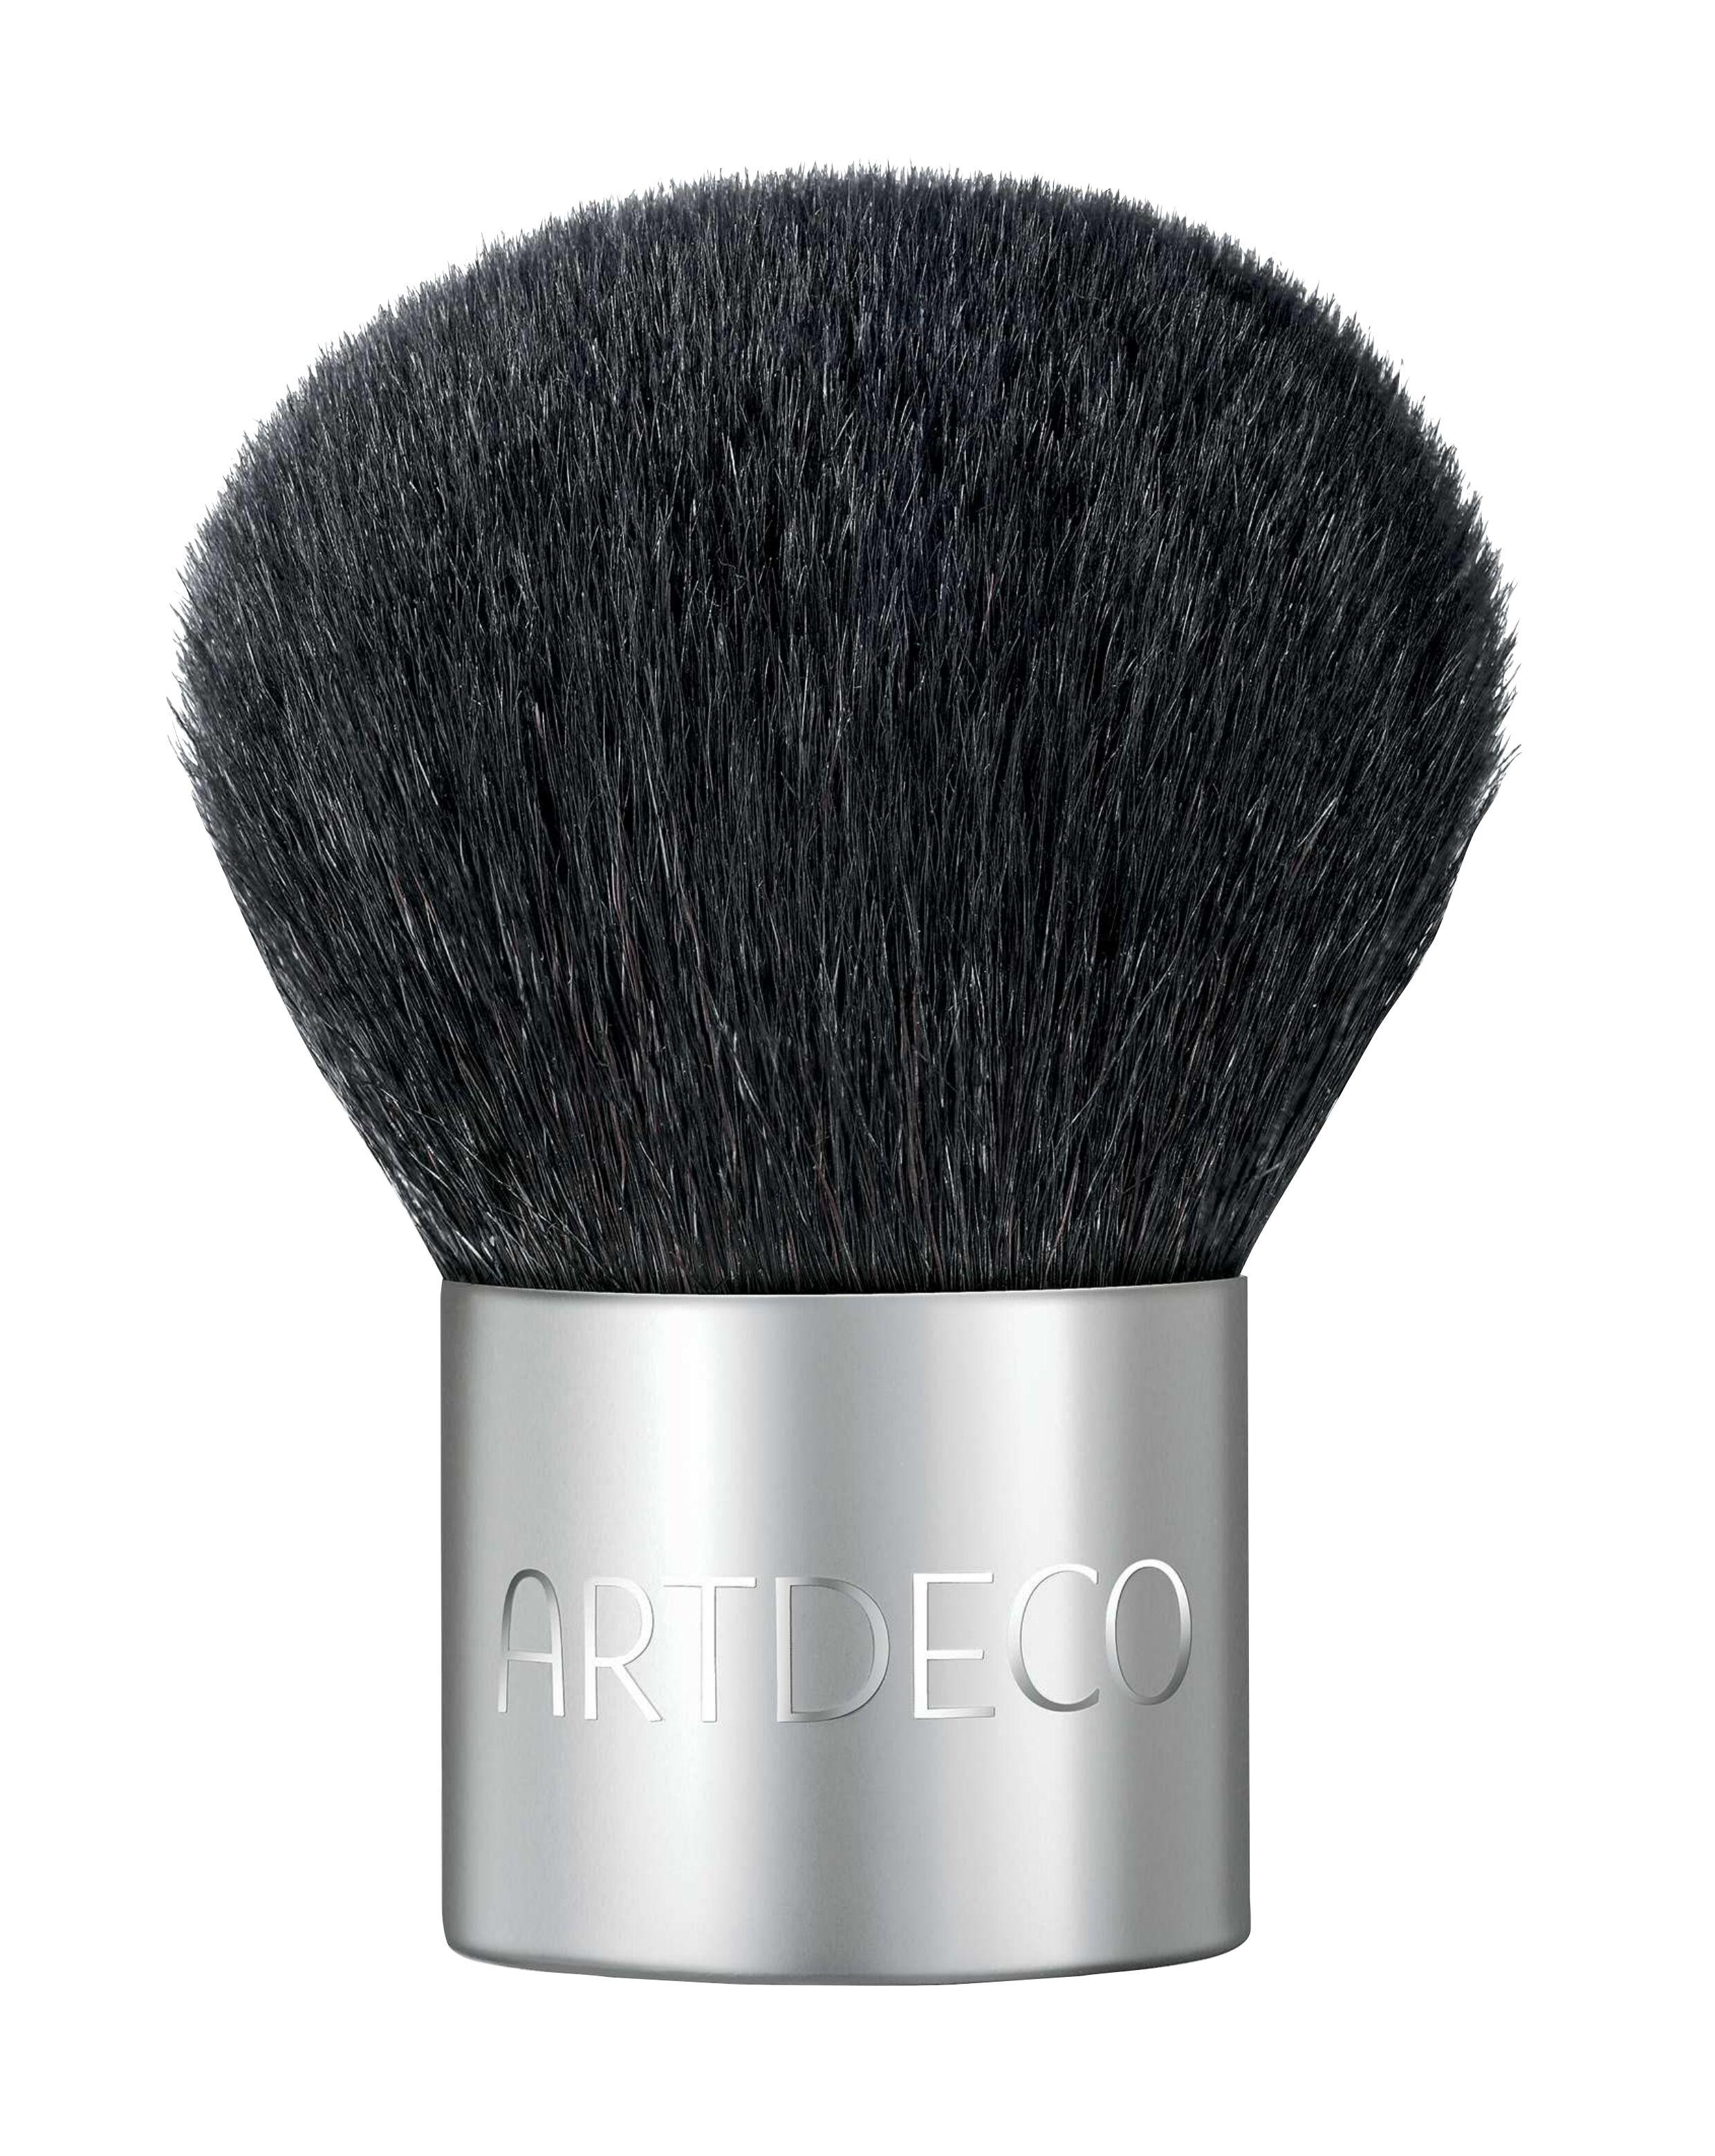 Artdeco Mineral Powder Brush